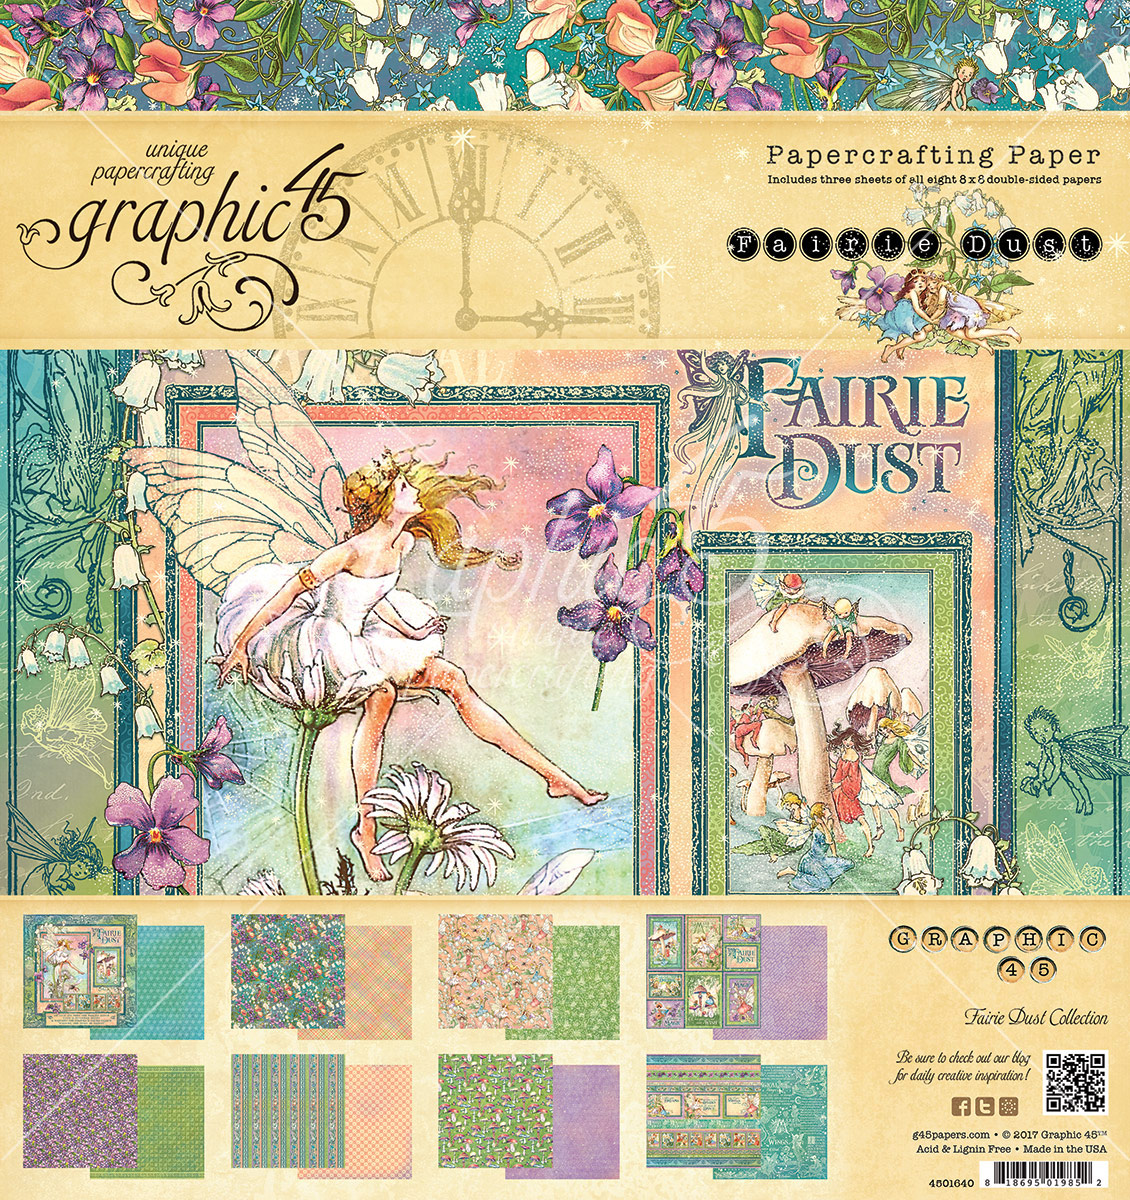 fairie-dust-8x8-pad-cvr.jpg